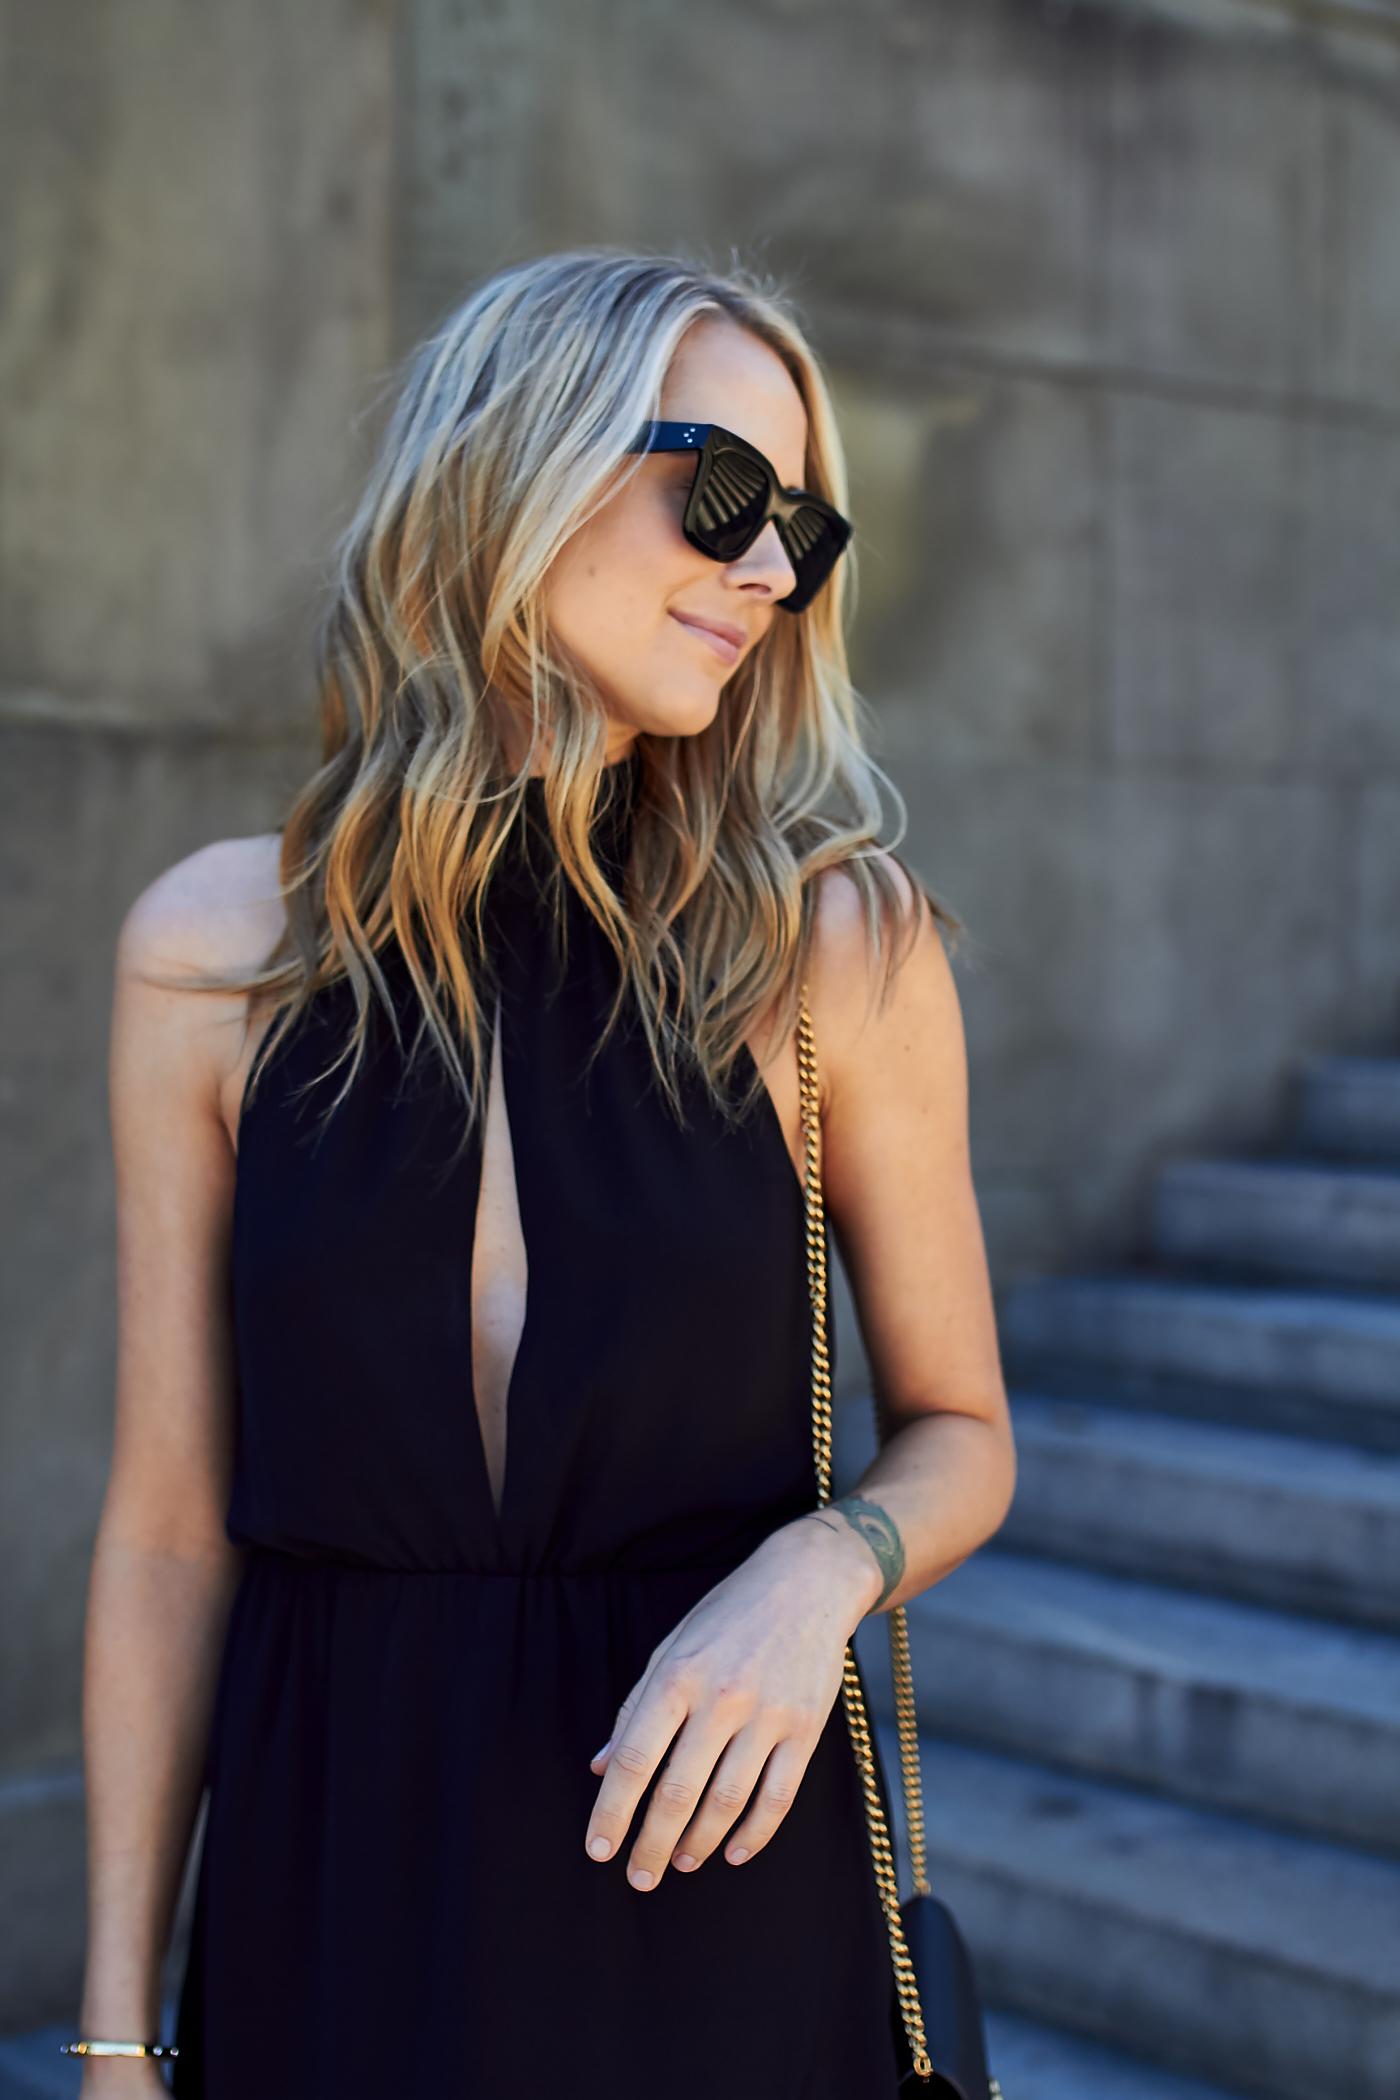 fashion-jackson-black-celine-sunglasses-black-plunge-neck-dress